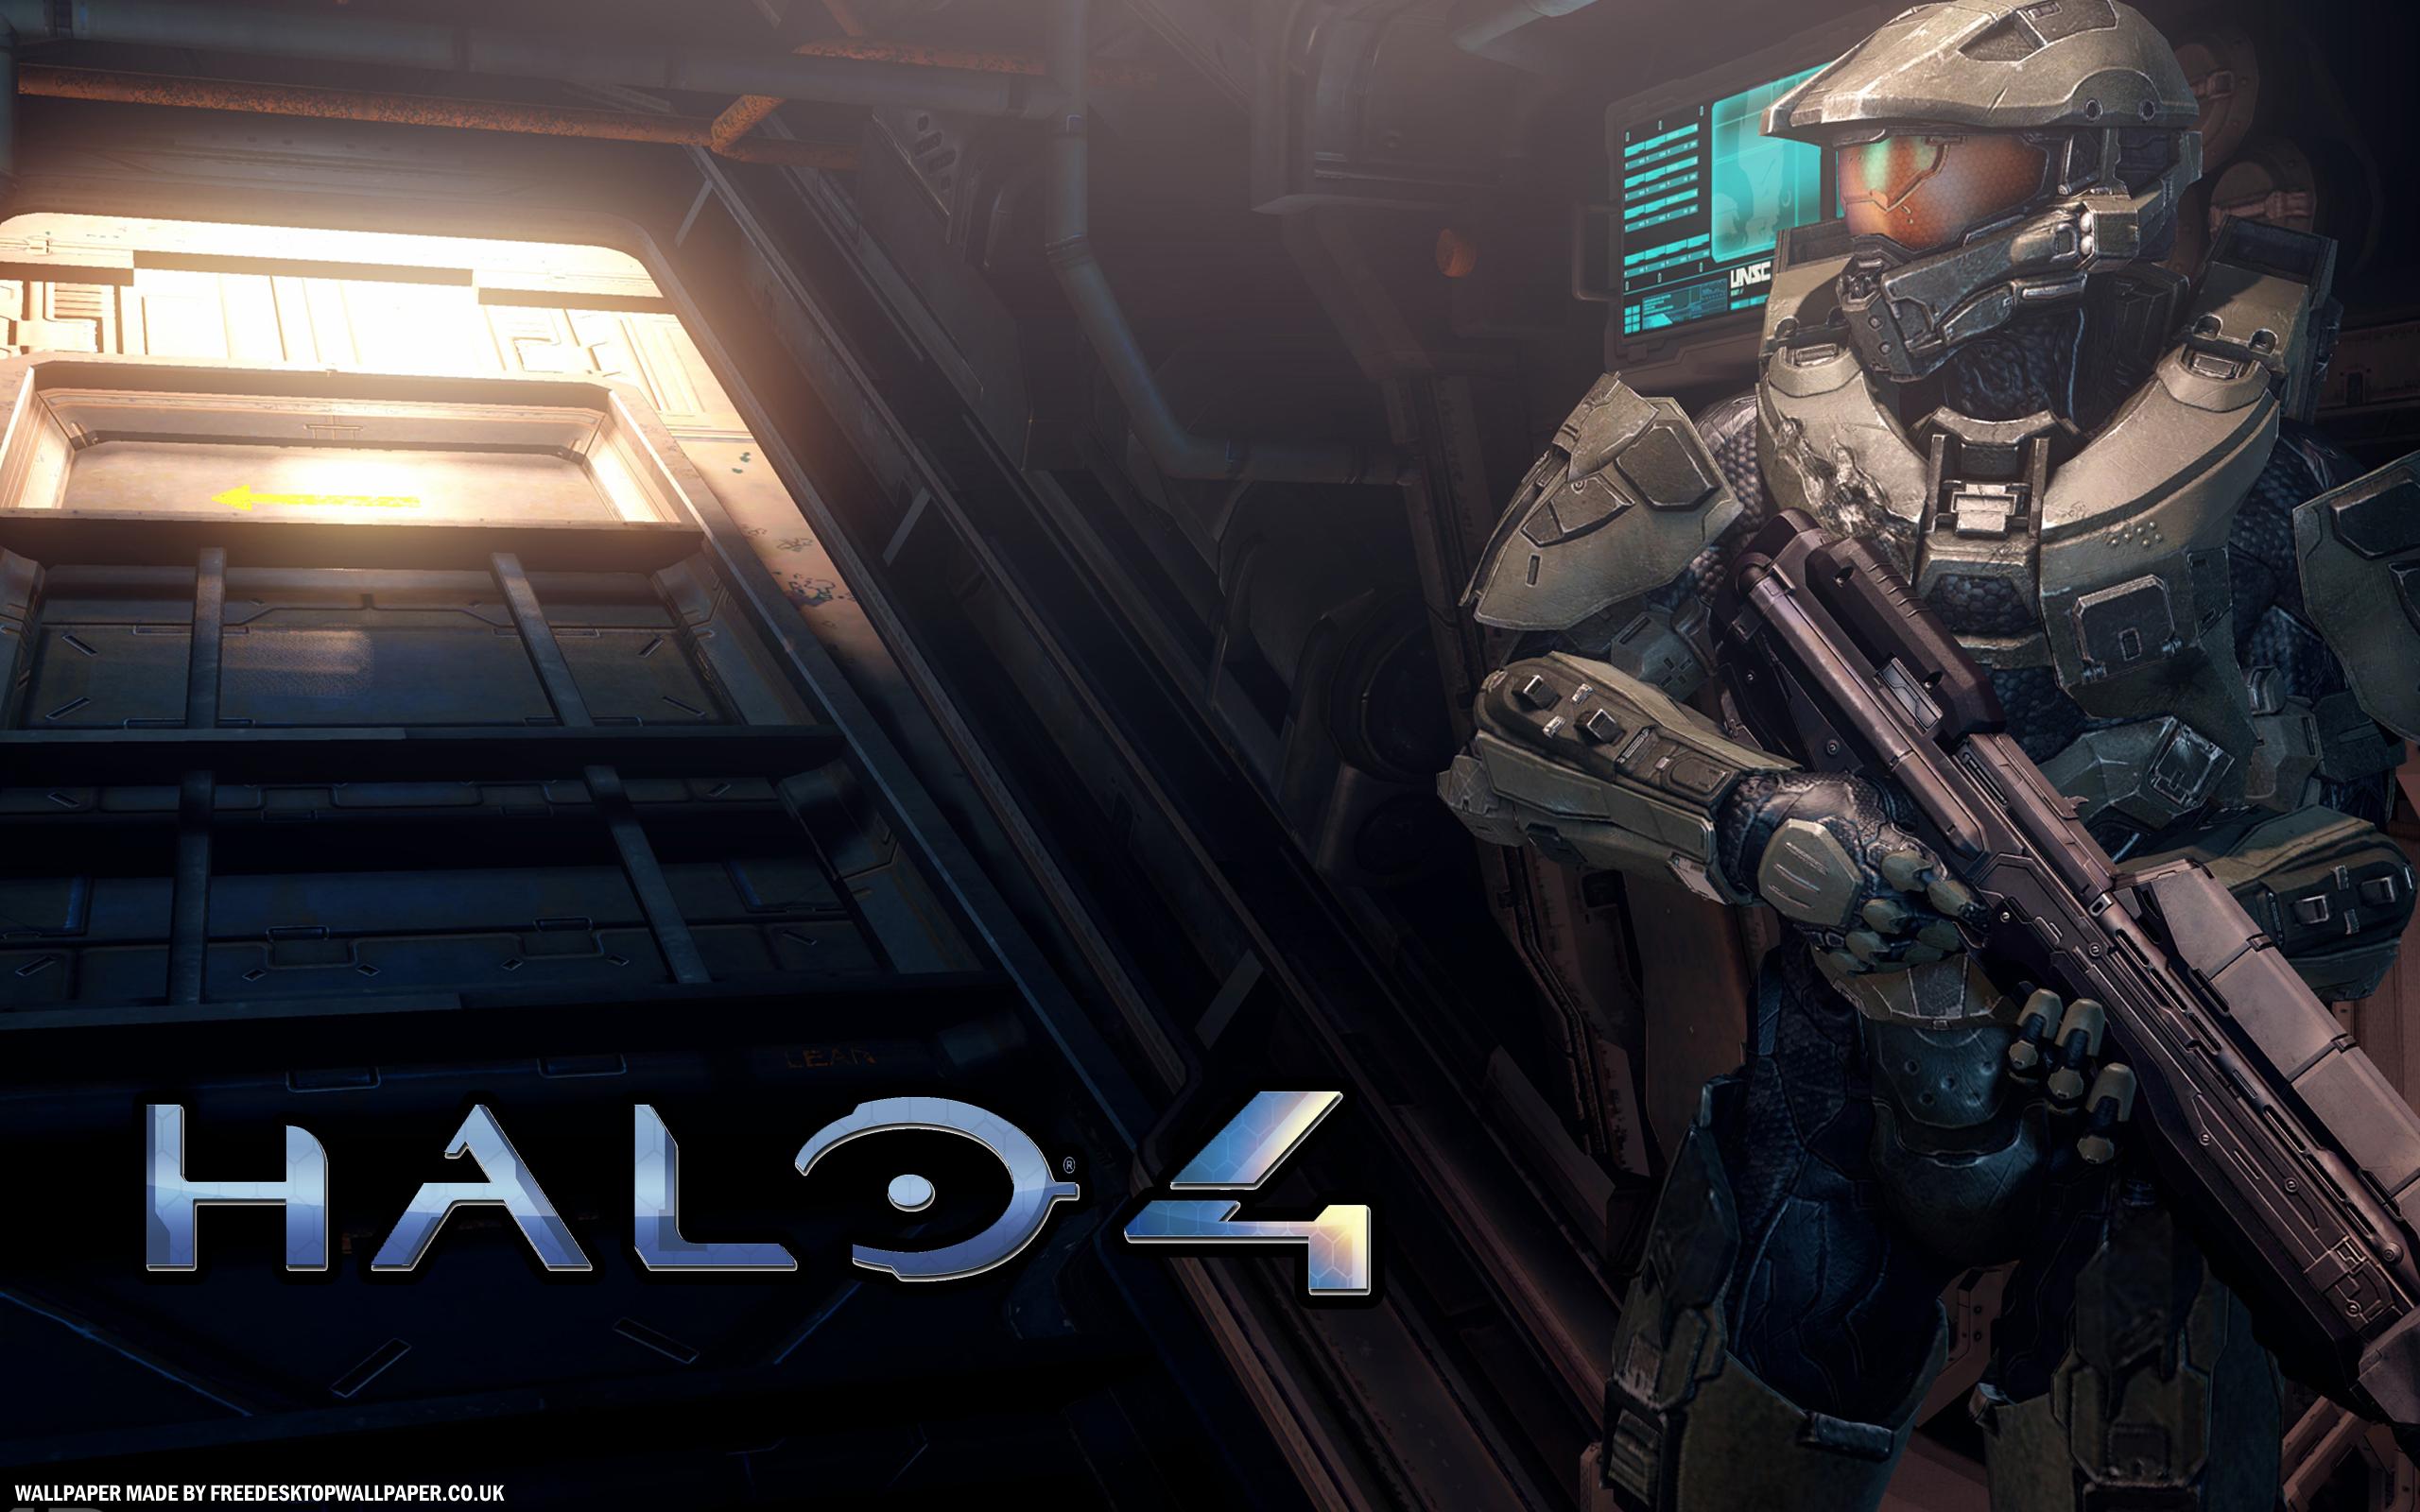 Download halo 4 games wallpaper 48 Halo 4 Hd Wallpaper [2560x1600 2560x1600